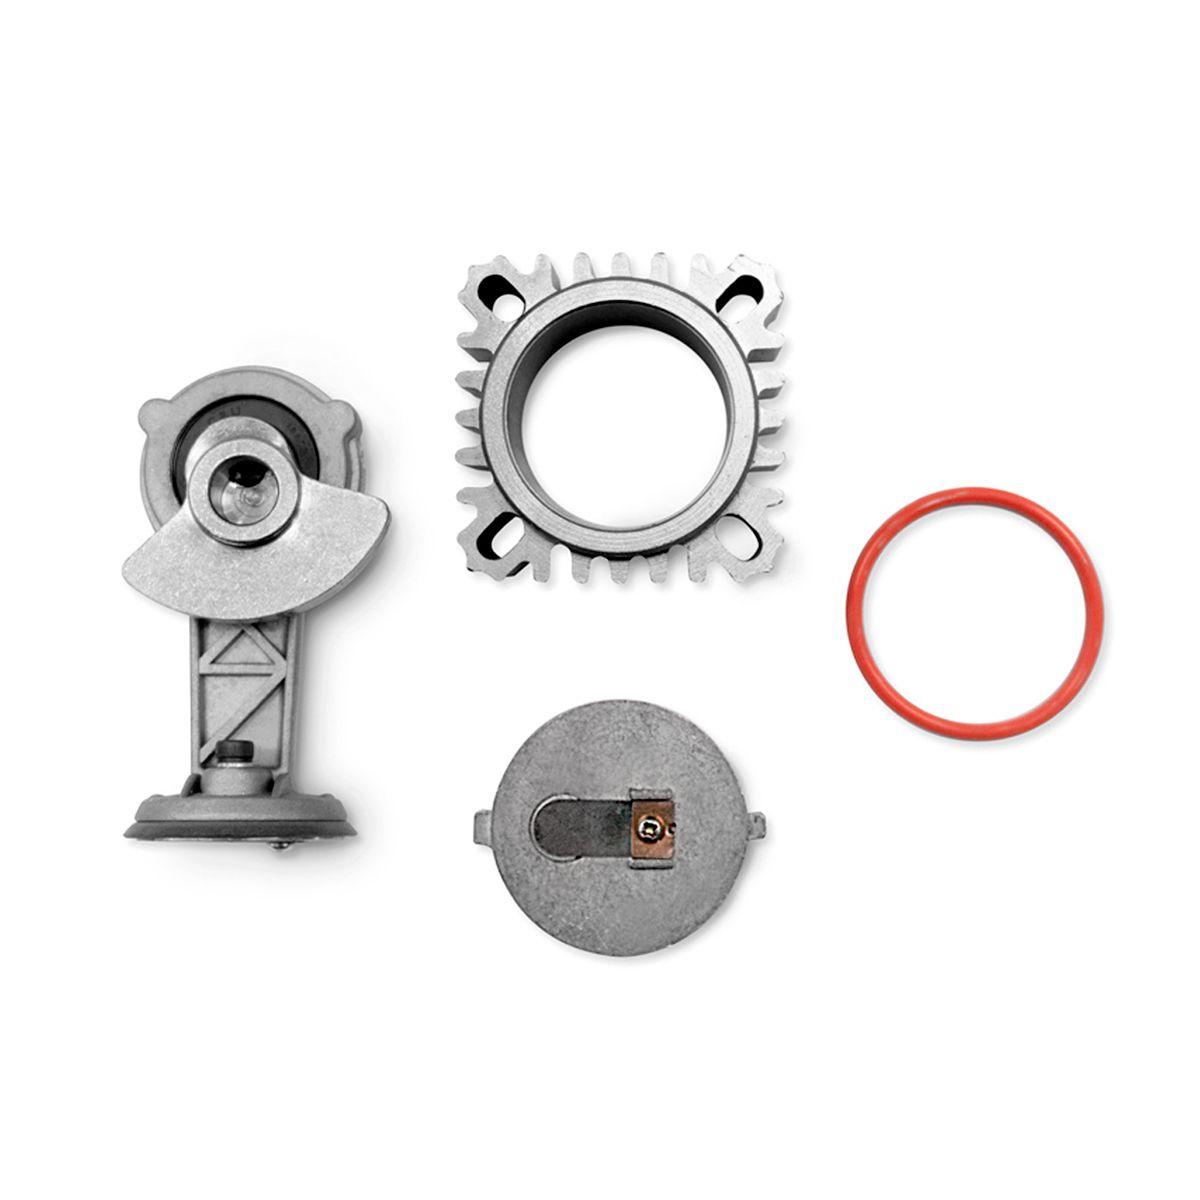 Kit Reparo Compressor Mod. 325c, 380c